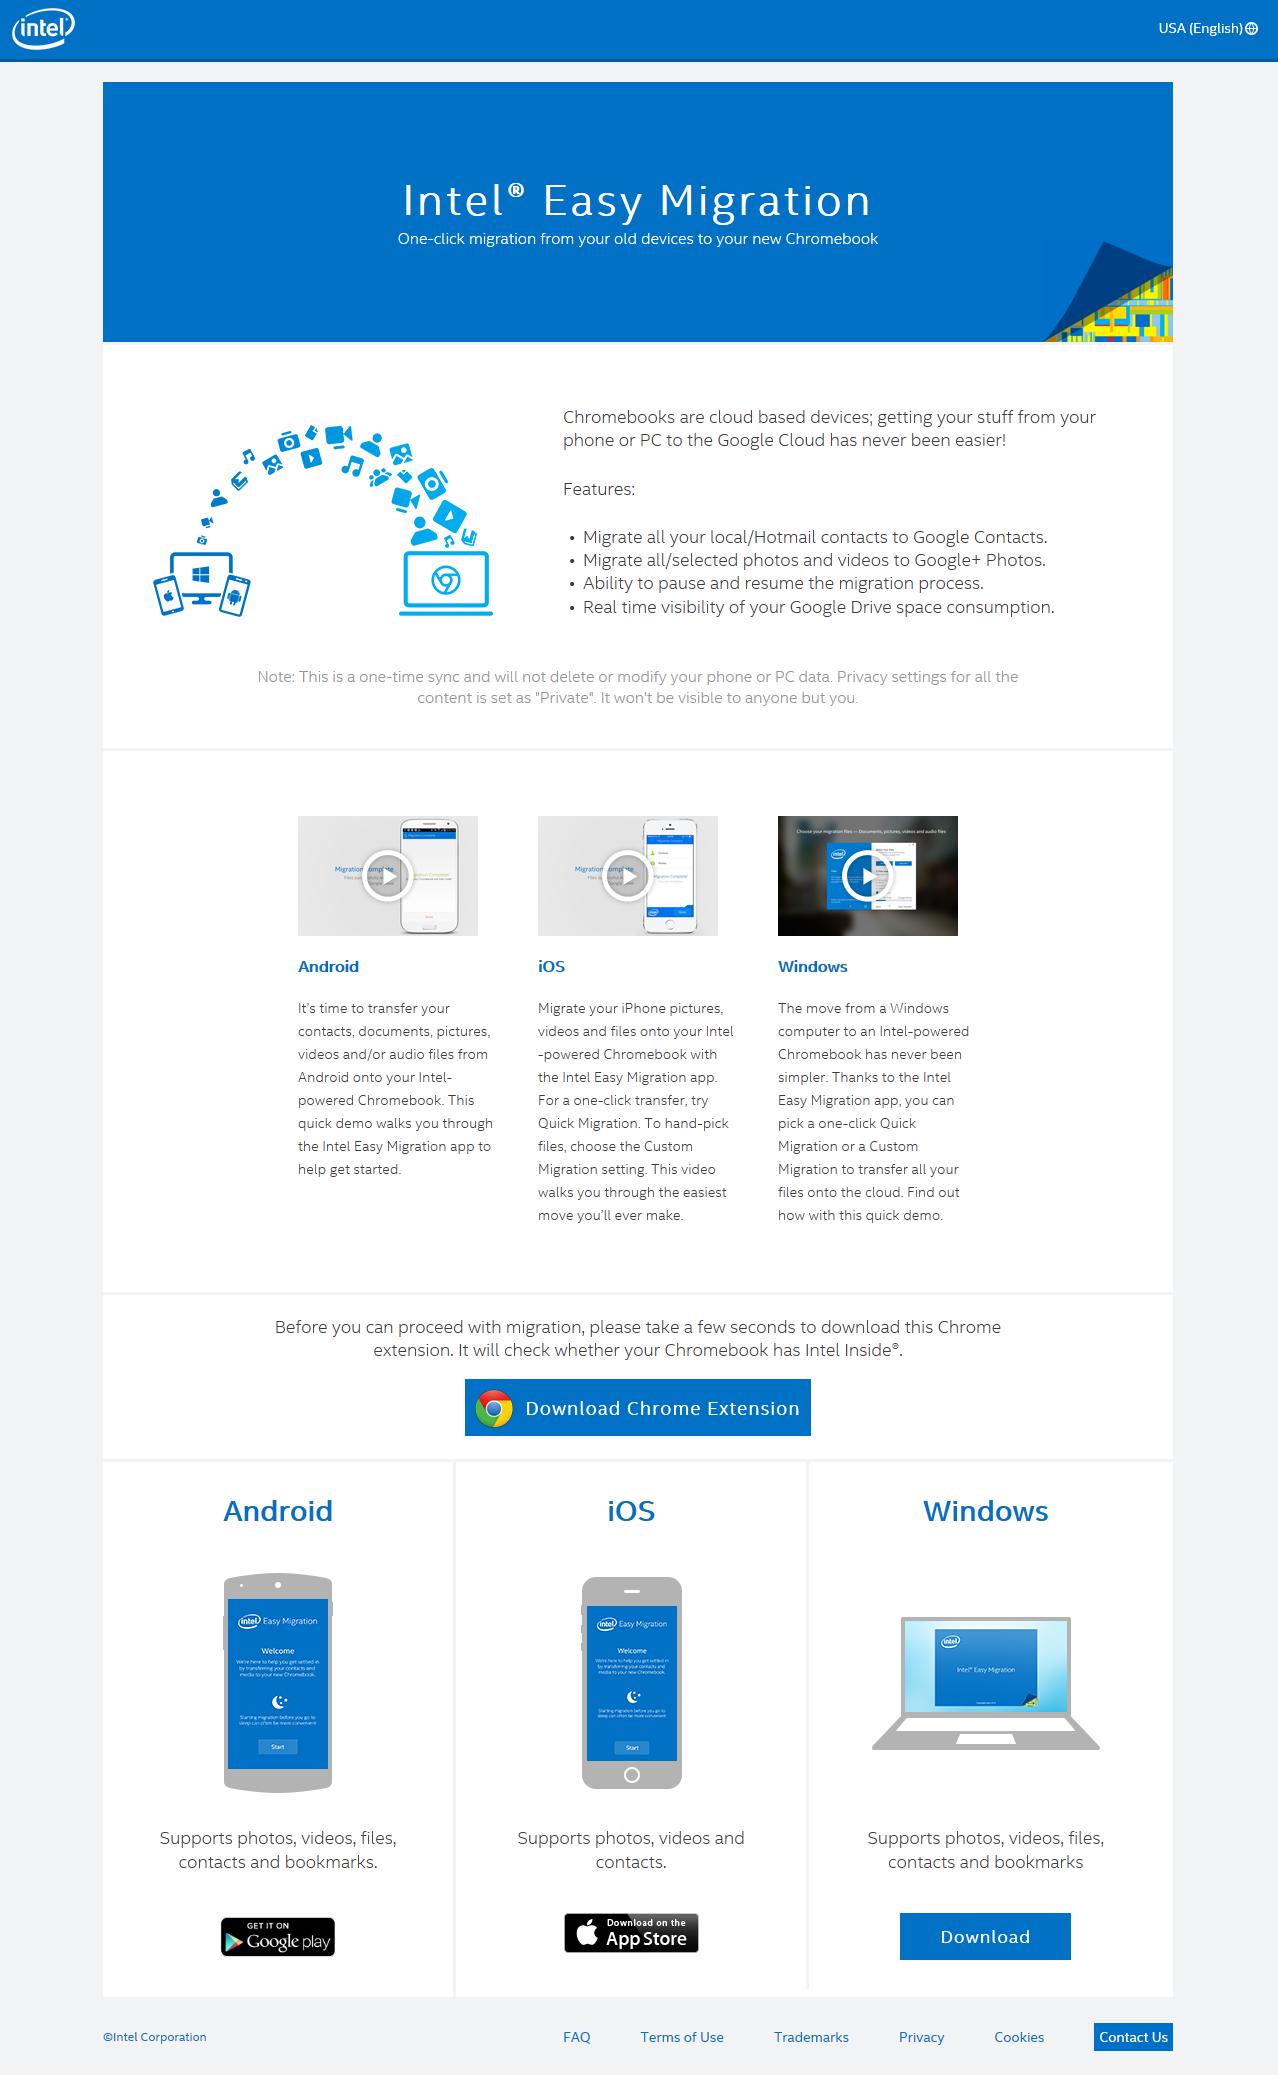 「Intel Easy Migration」ウェブサイト